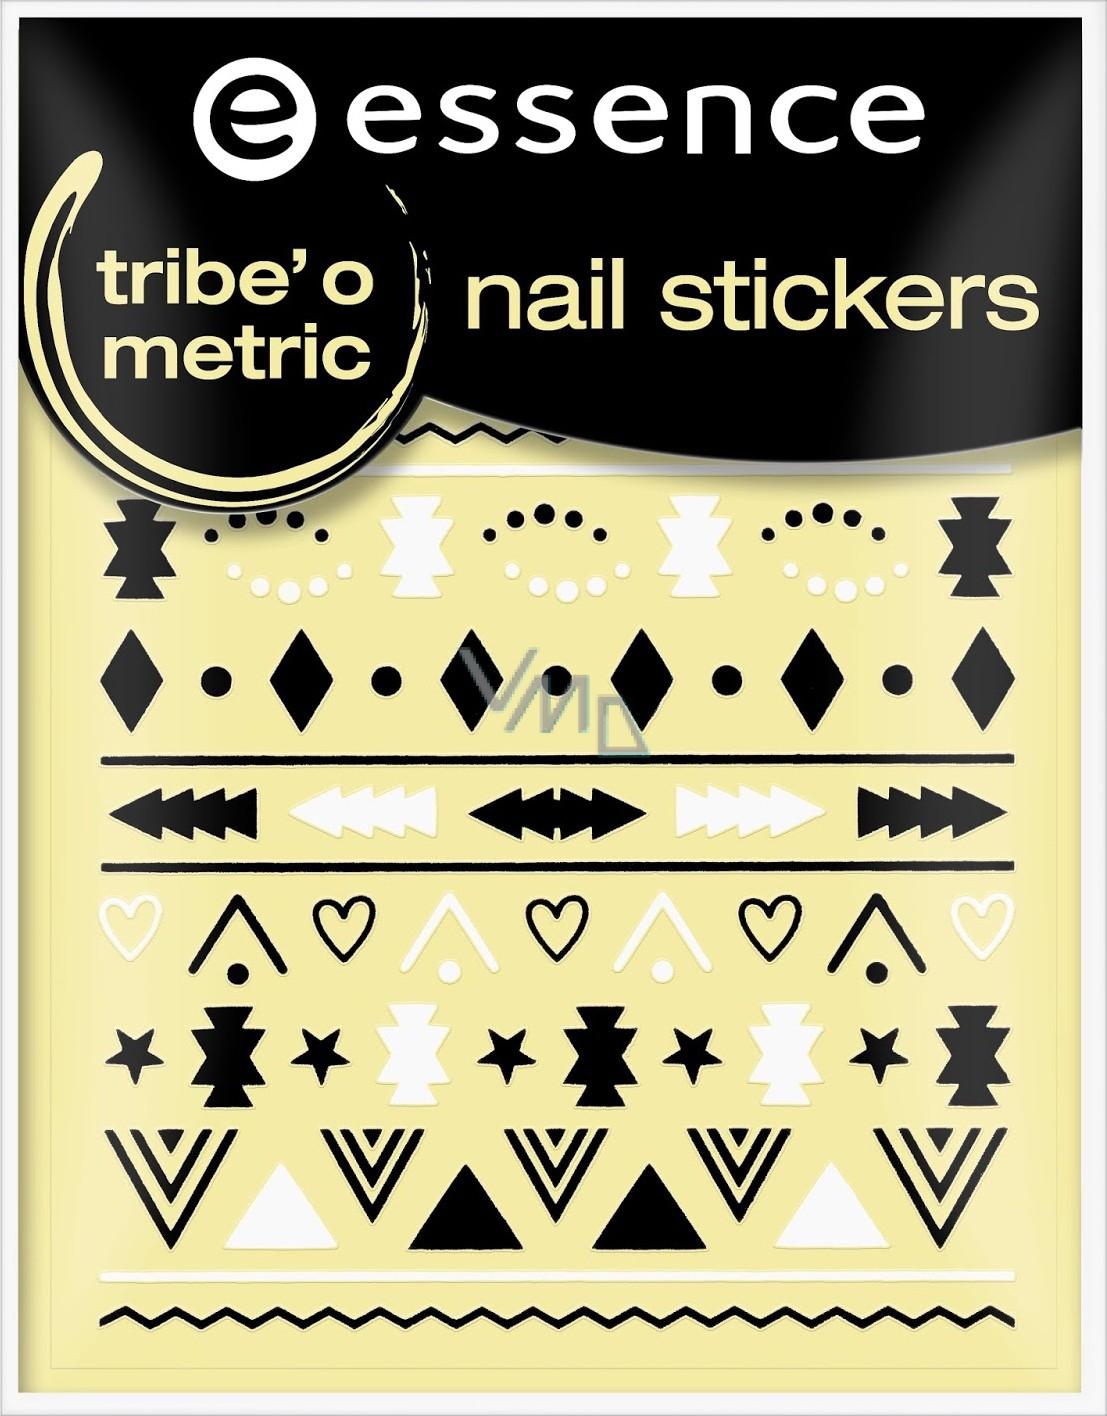 Essence Nail Art Nlepky Na Nehty 18 Trib O Metric 1 Ark Vmd